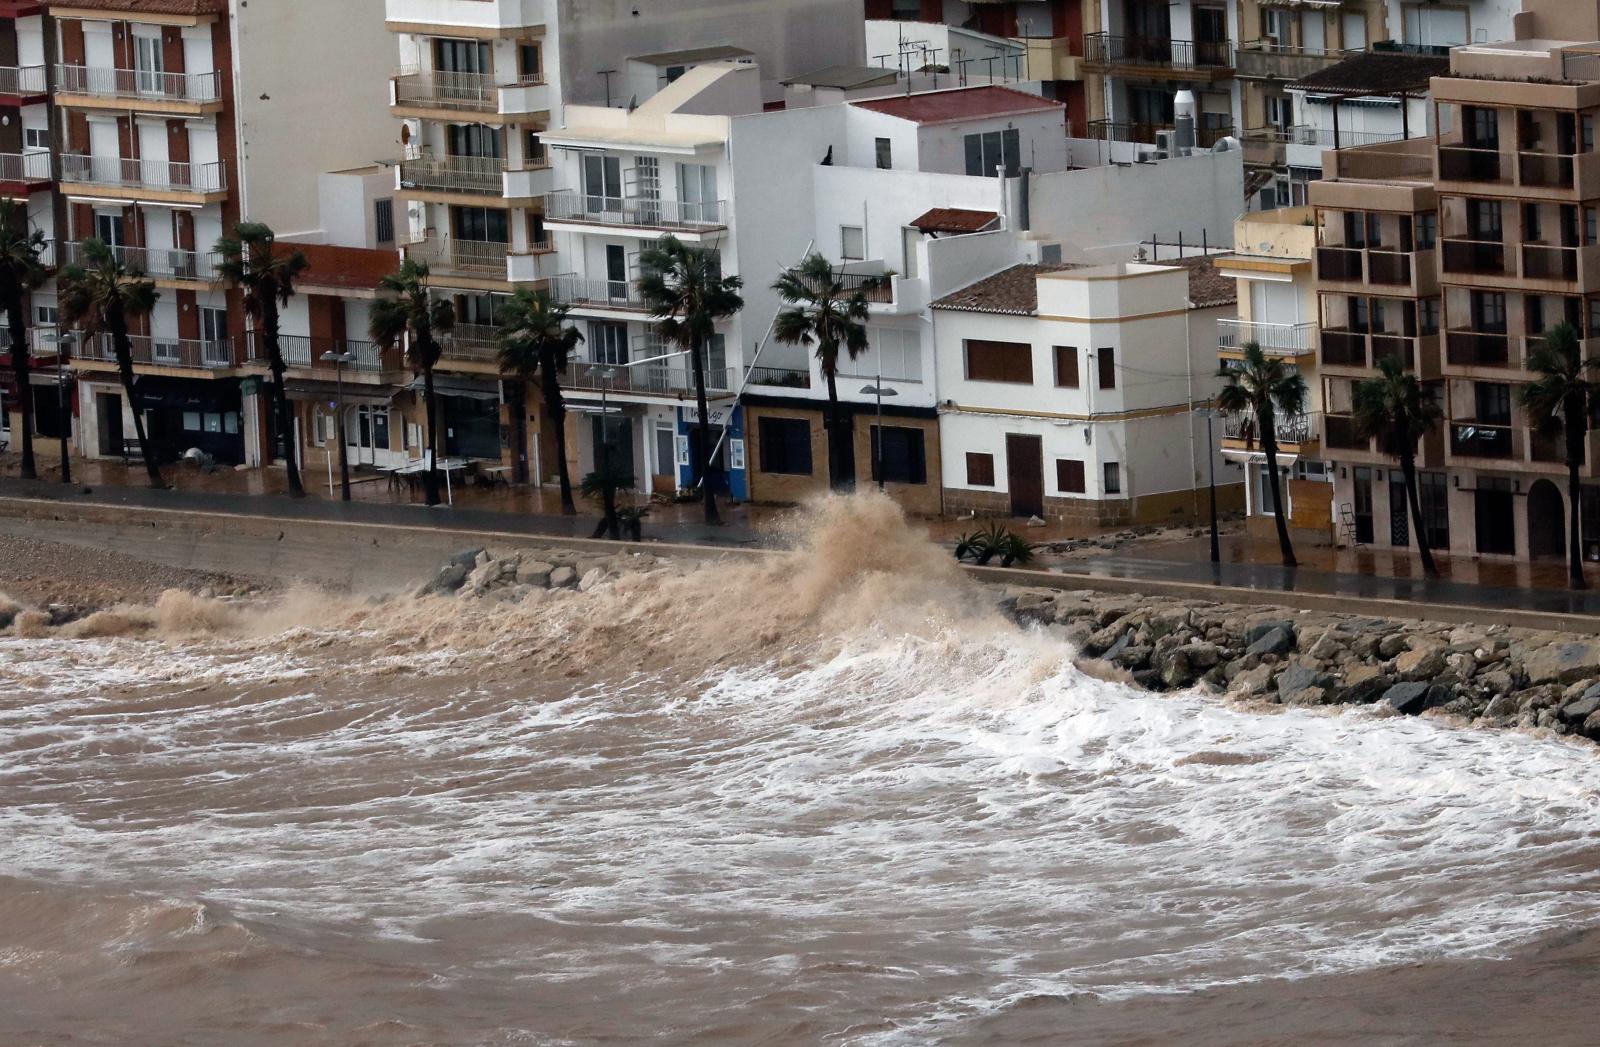 Sztorm w Hiszpanii EPA/Juan Carlos Cardenas